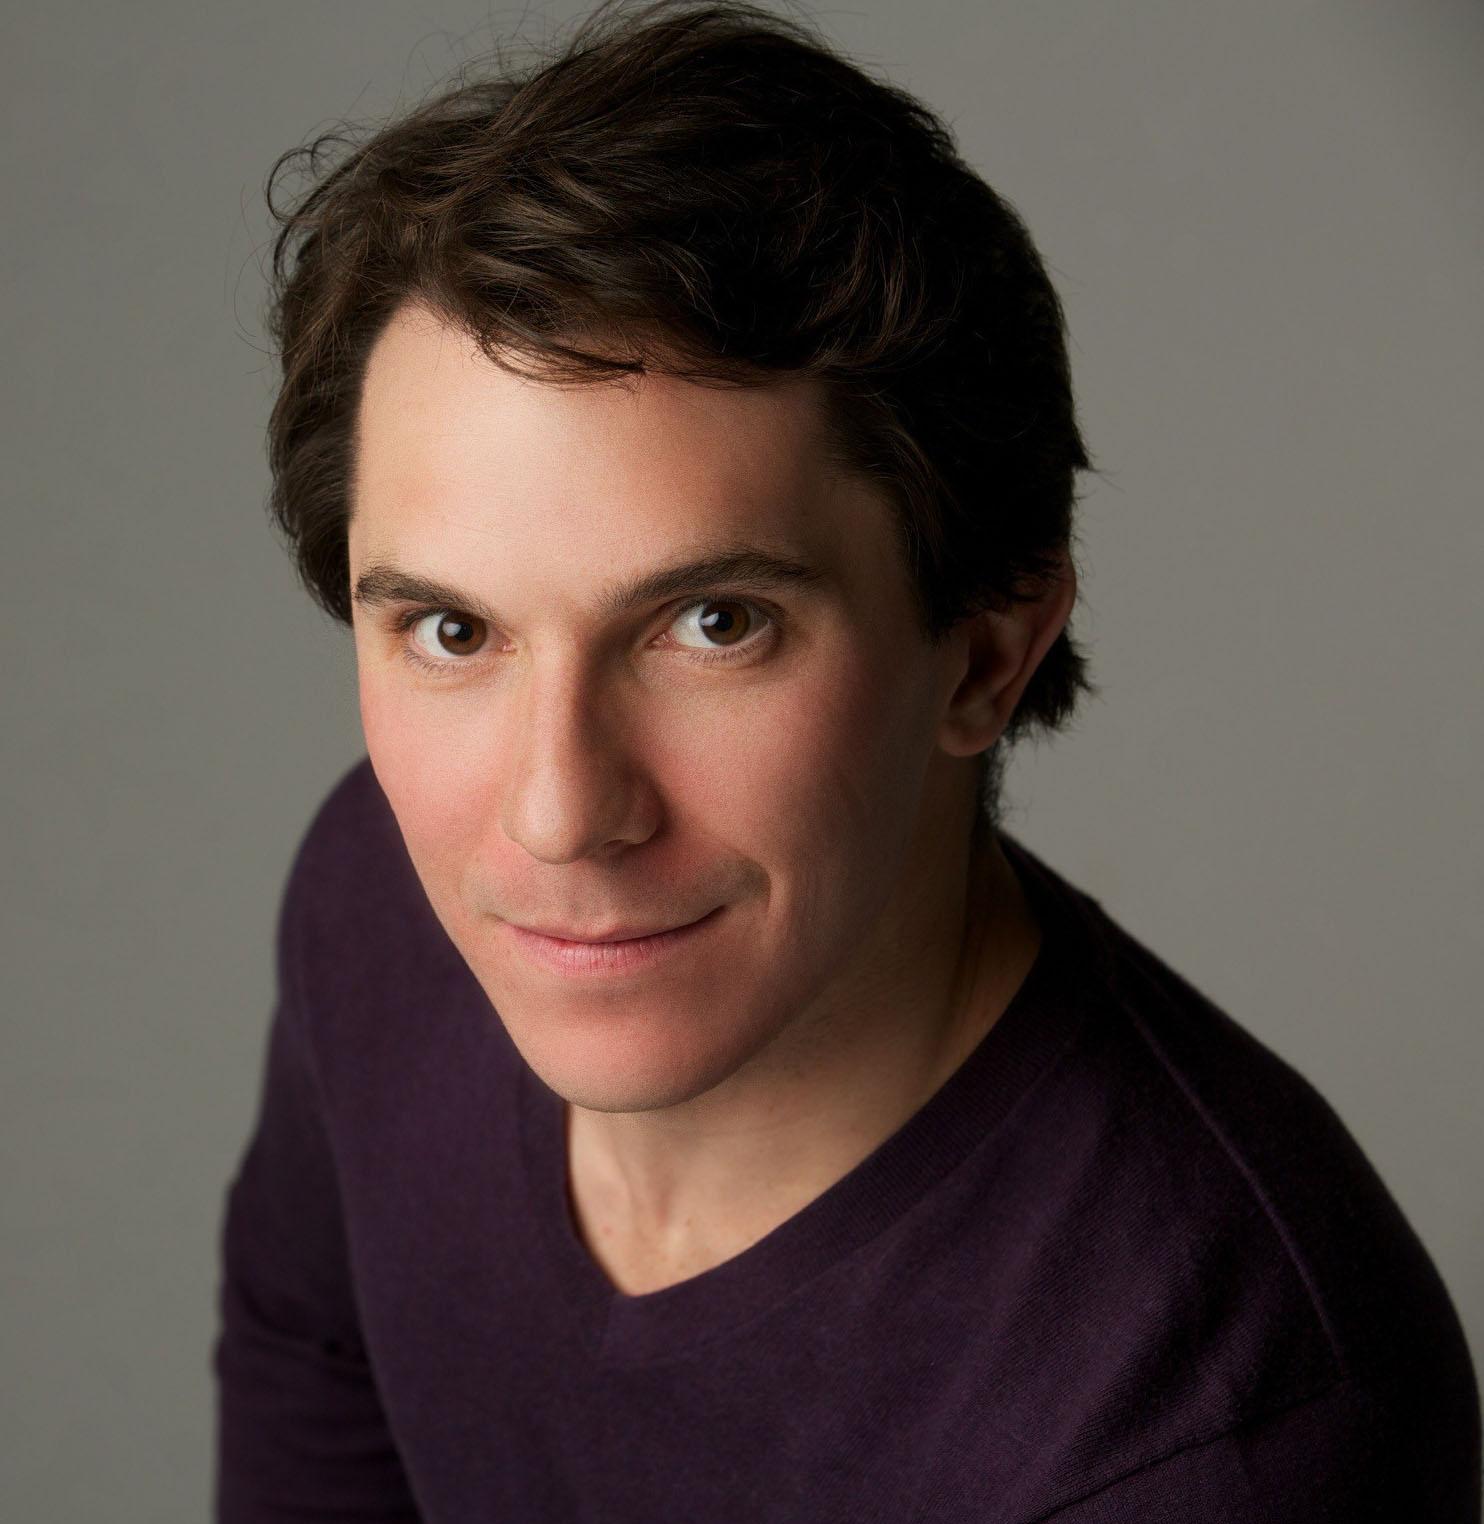 Ryan Coughlan, Assistant Professor of Sociology